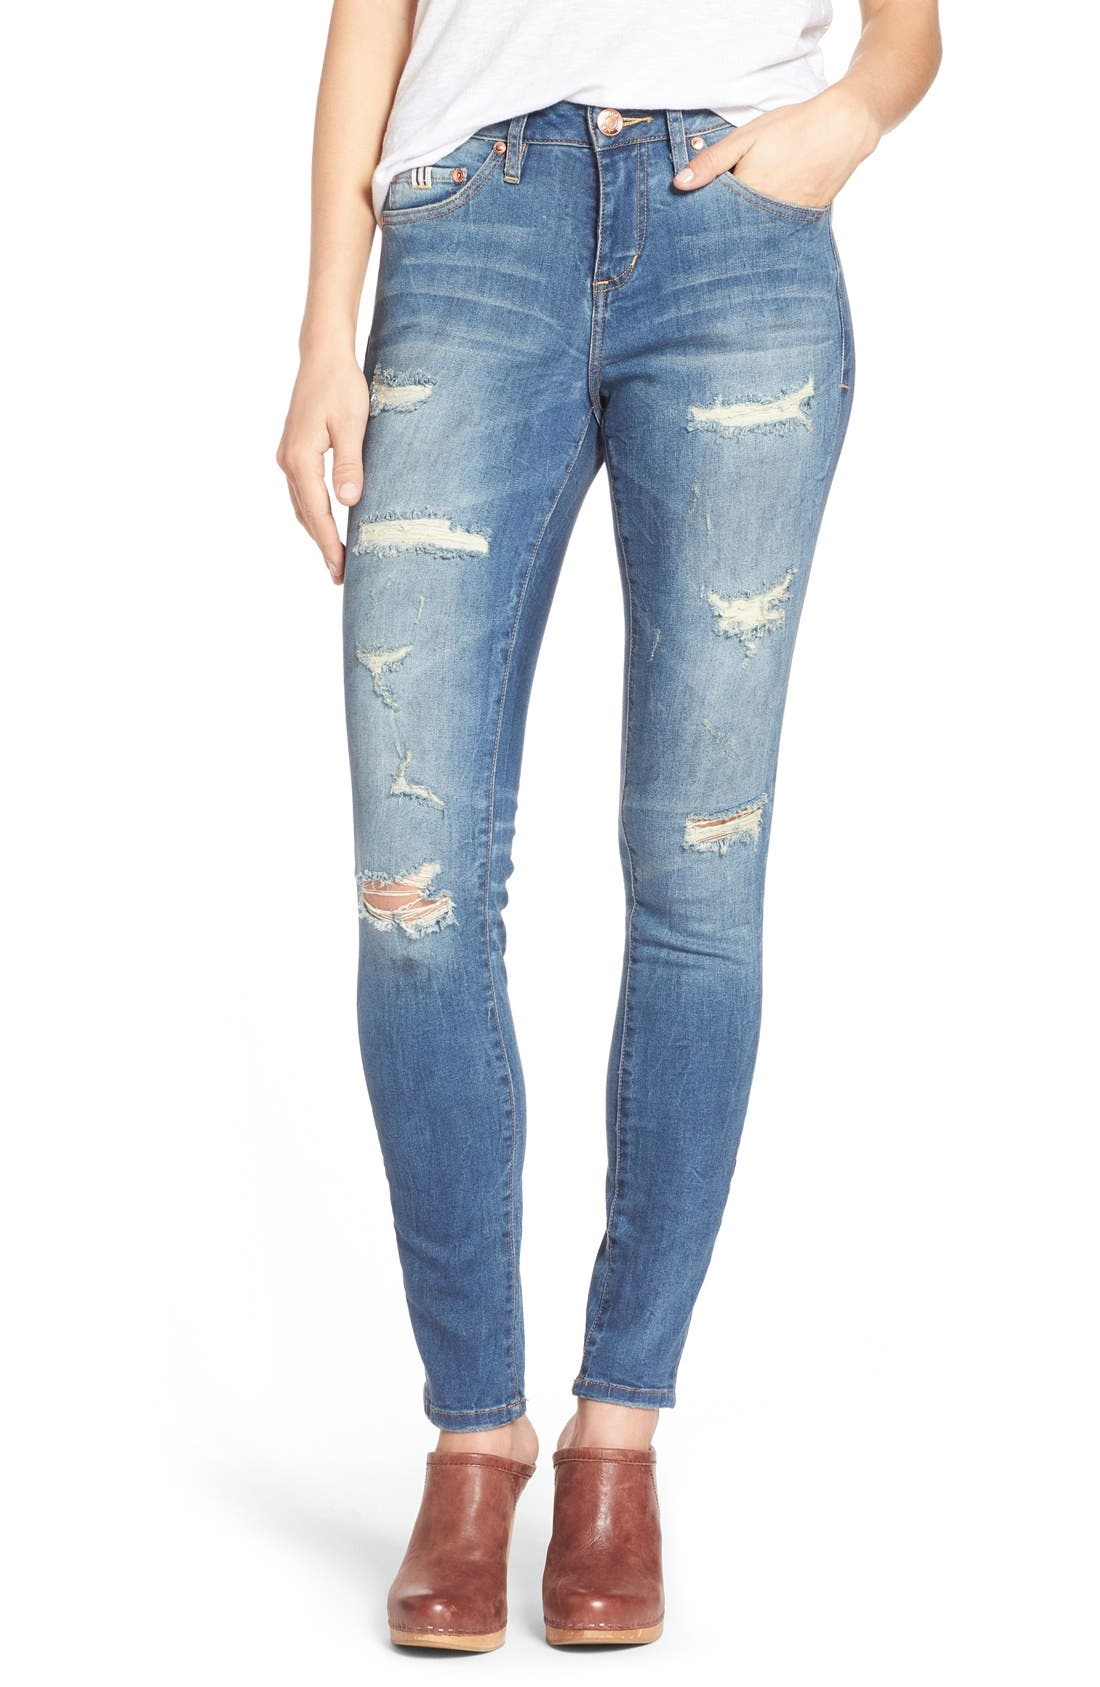 Jag Jeans Sheridan Distressed Skinny Jeans (Blue Carbon) (Regular & Petite)